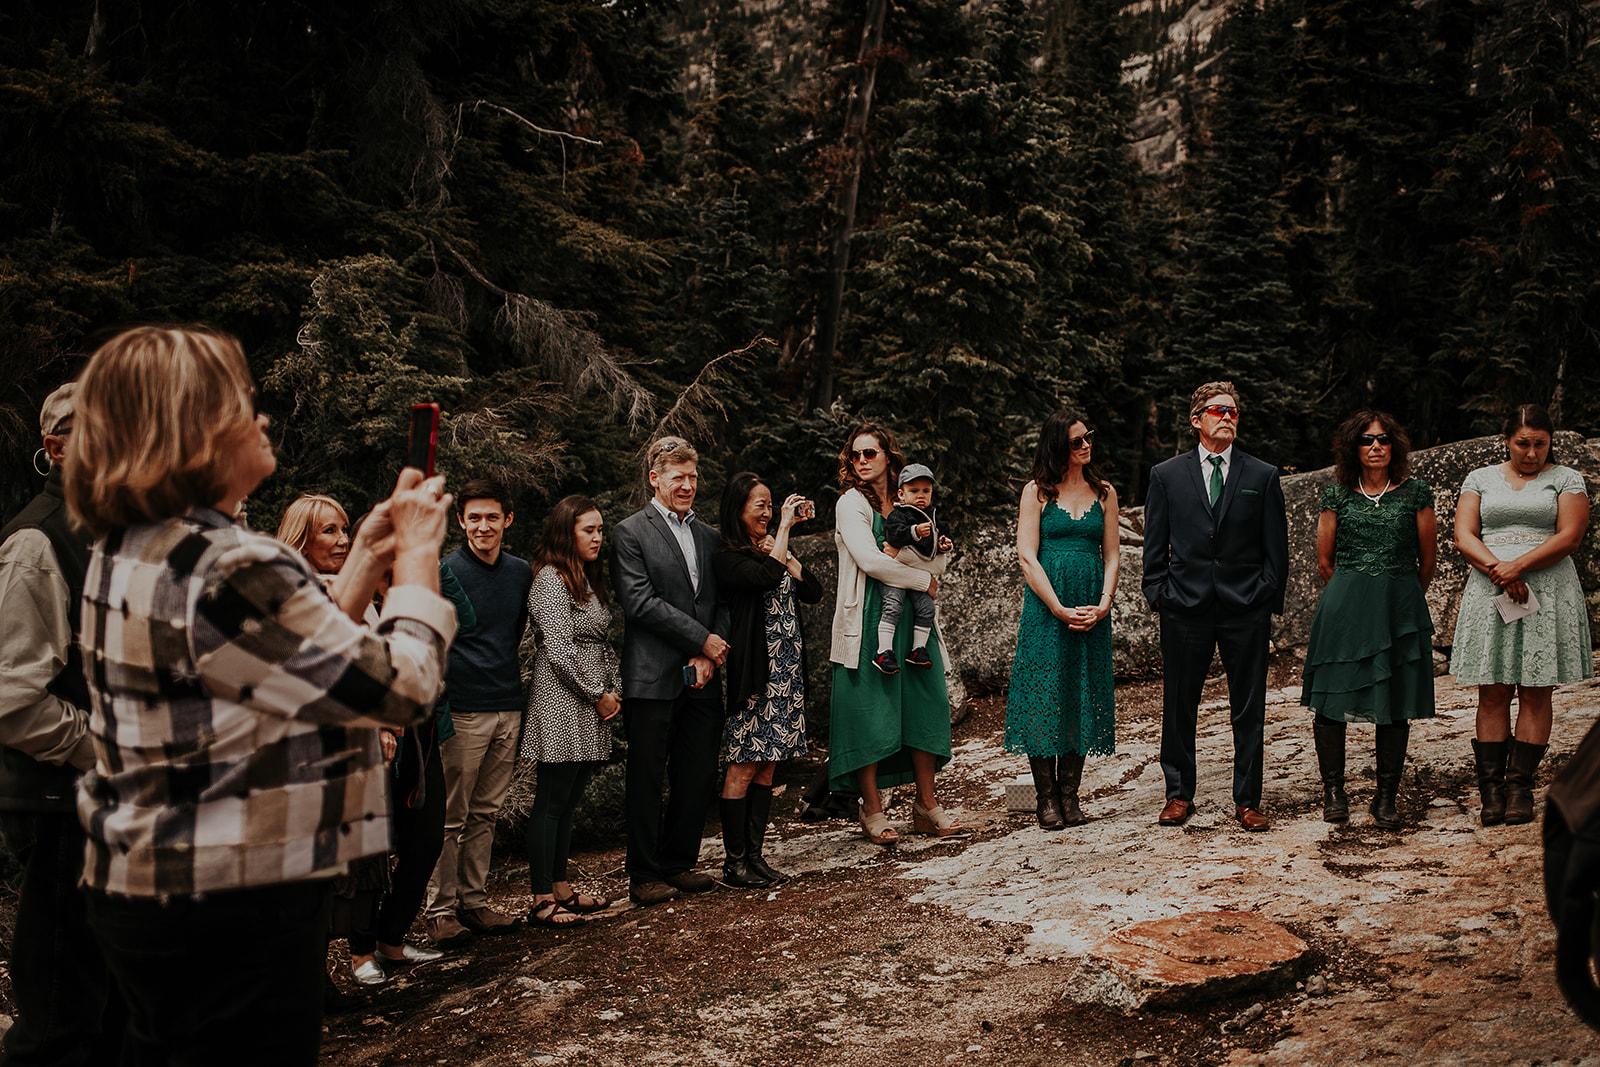 winthrop-wedding-photographer-megan-gallagher-photography (12).jpg